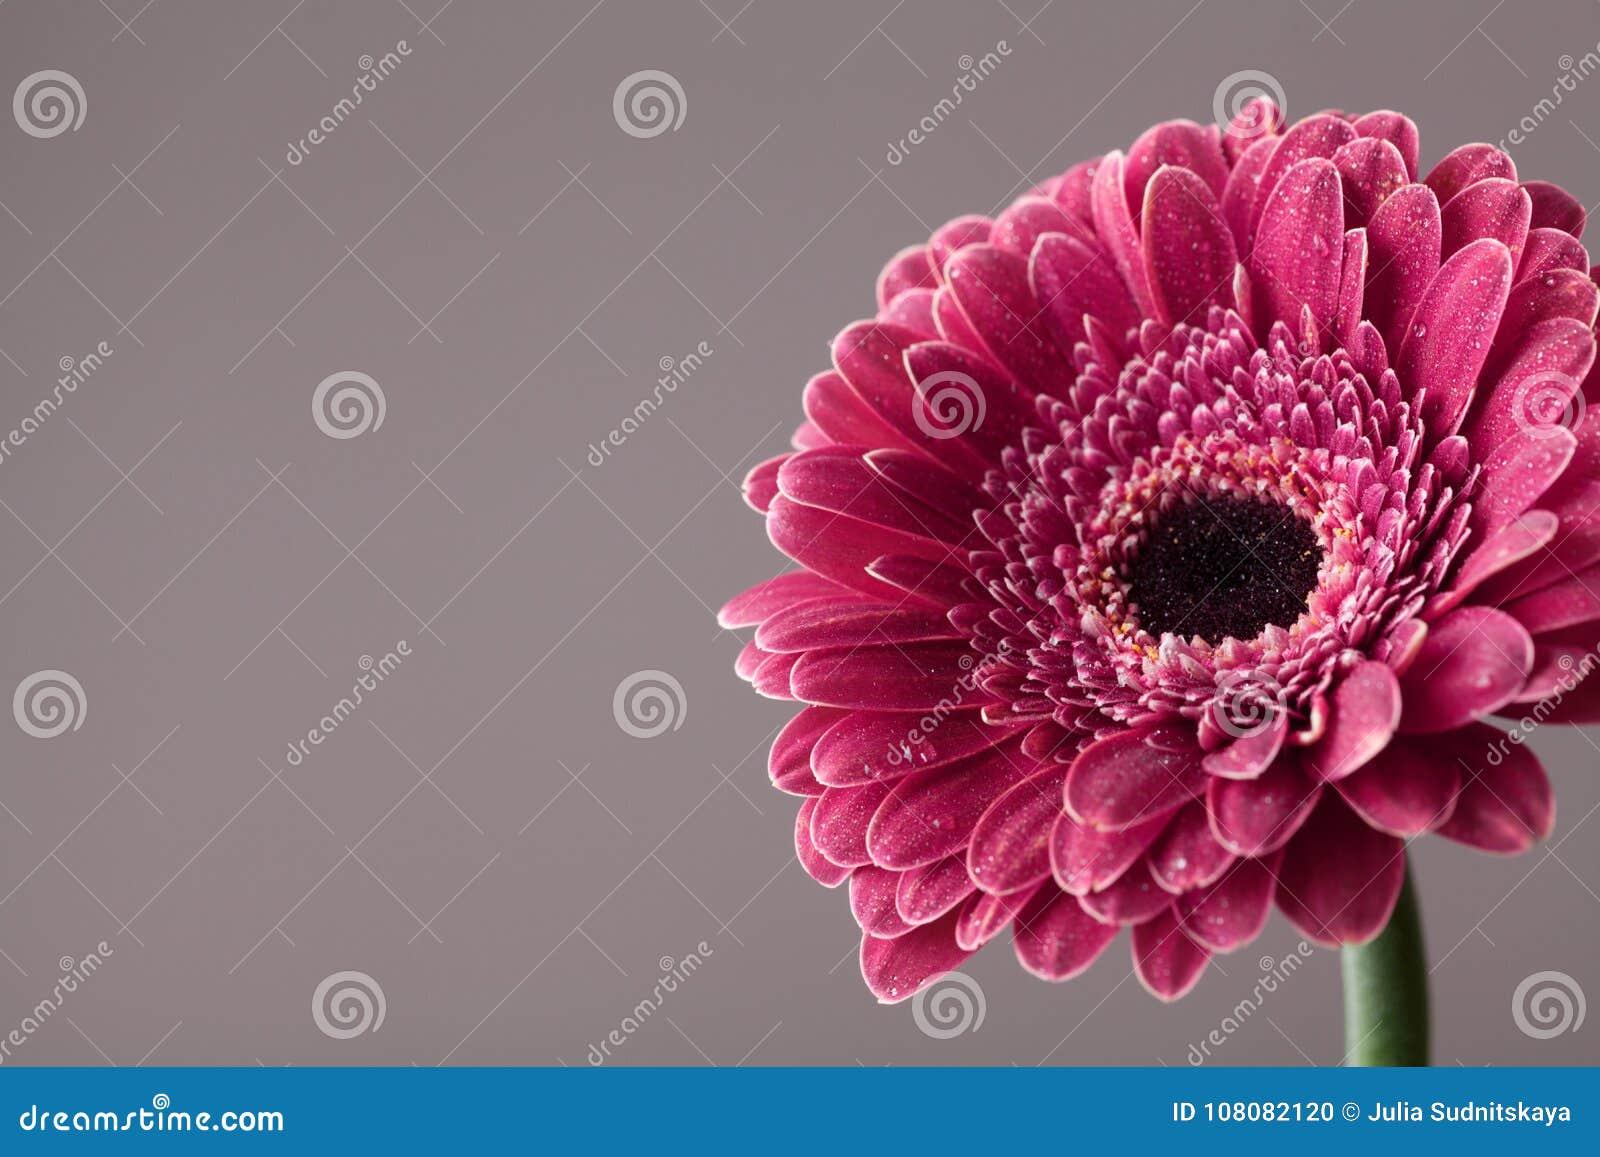 Beautiful gerbera daisy flower in water drops greeting card for download beautiful gerbera daisy flower in water drops greeting card for birthday mother or izmirmasajfo